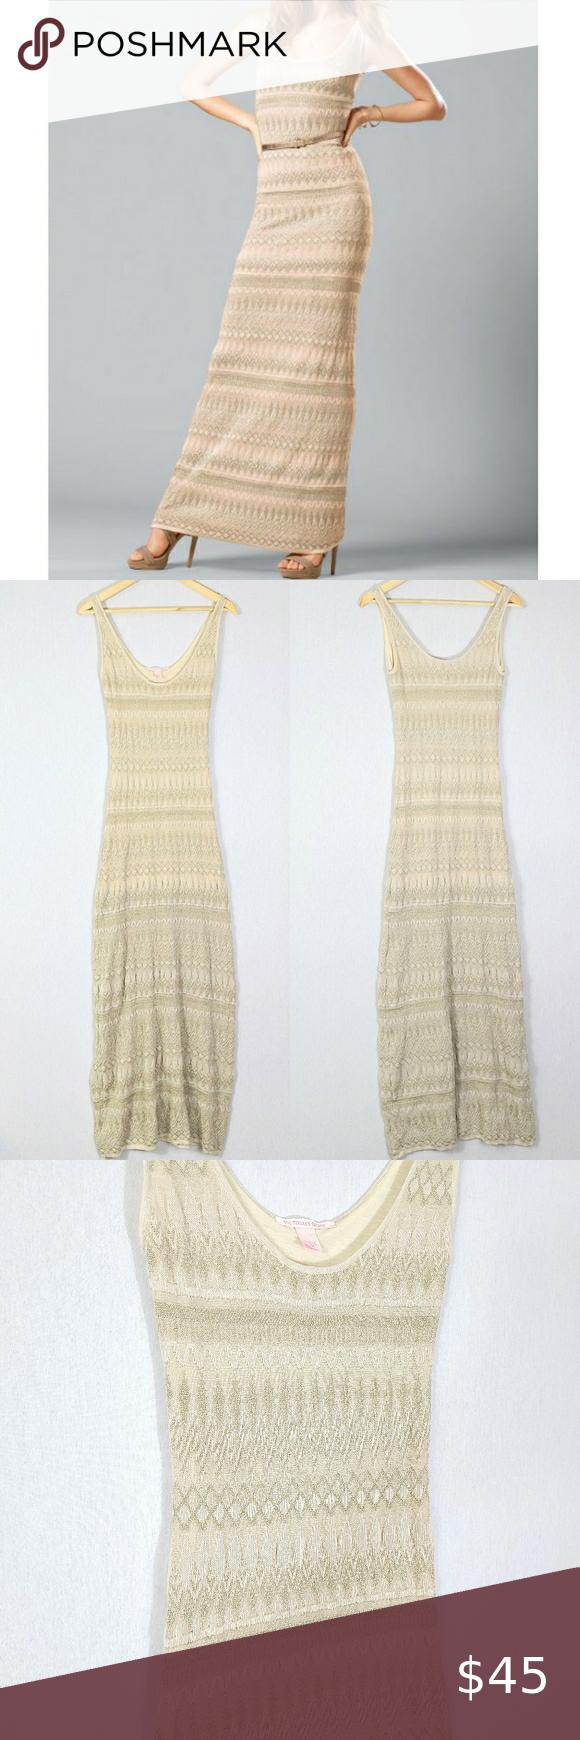 Victorias Secret Metallic Gold Knit Maxi Dress Maxi Knit Dress Victoria Secret Maxi Dress [ 1740 x 580 Pixel ]